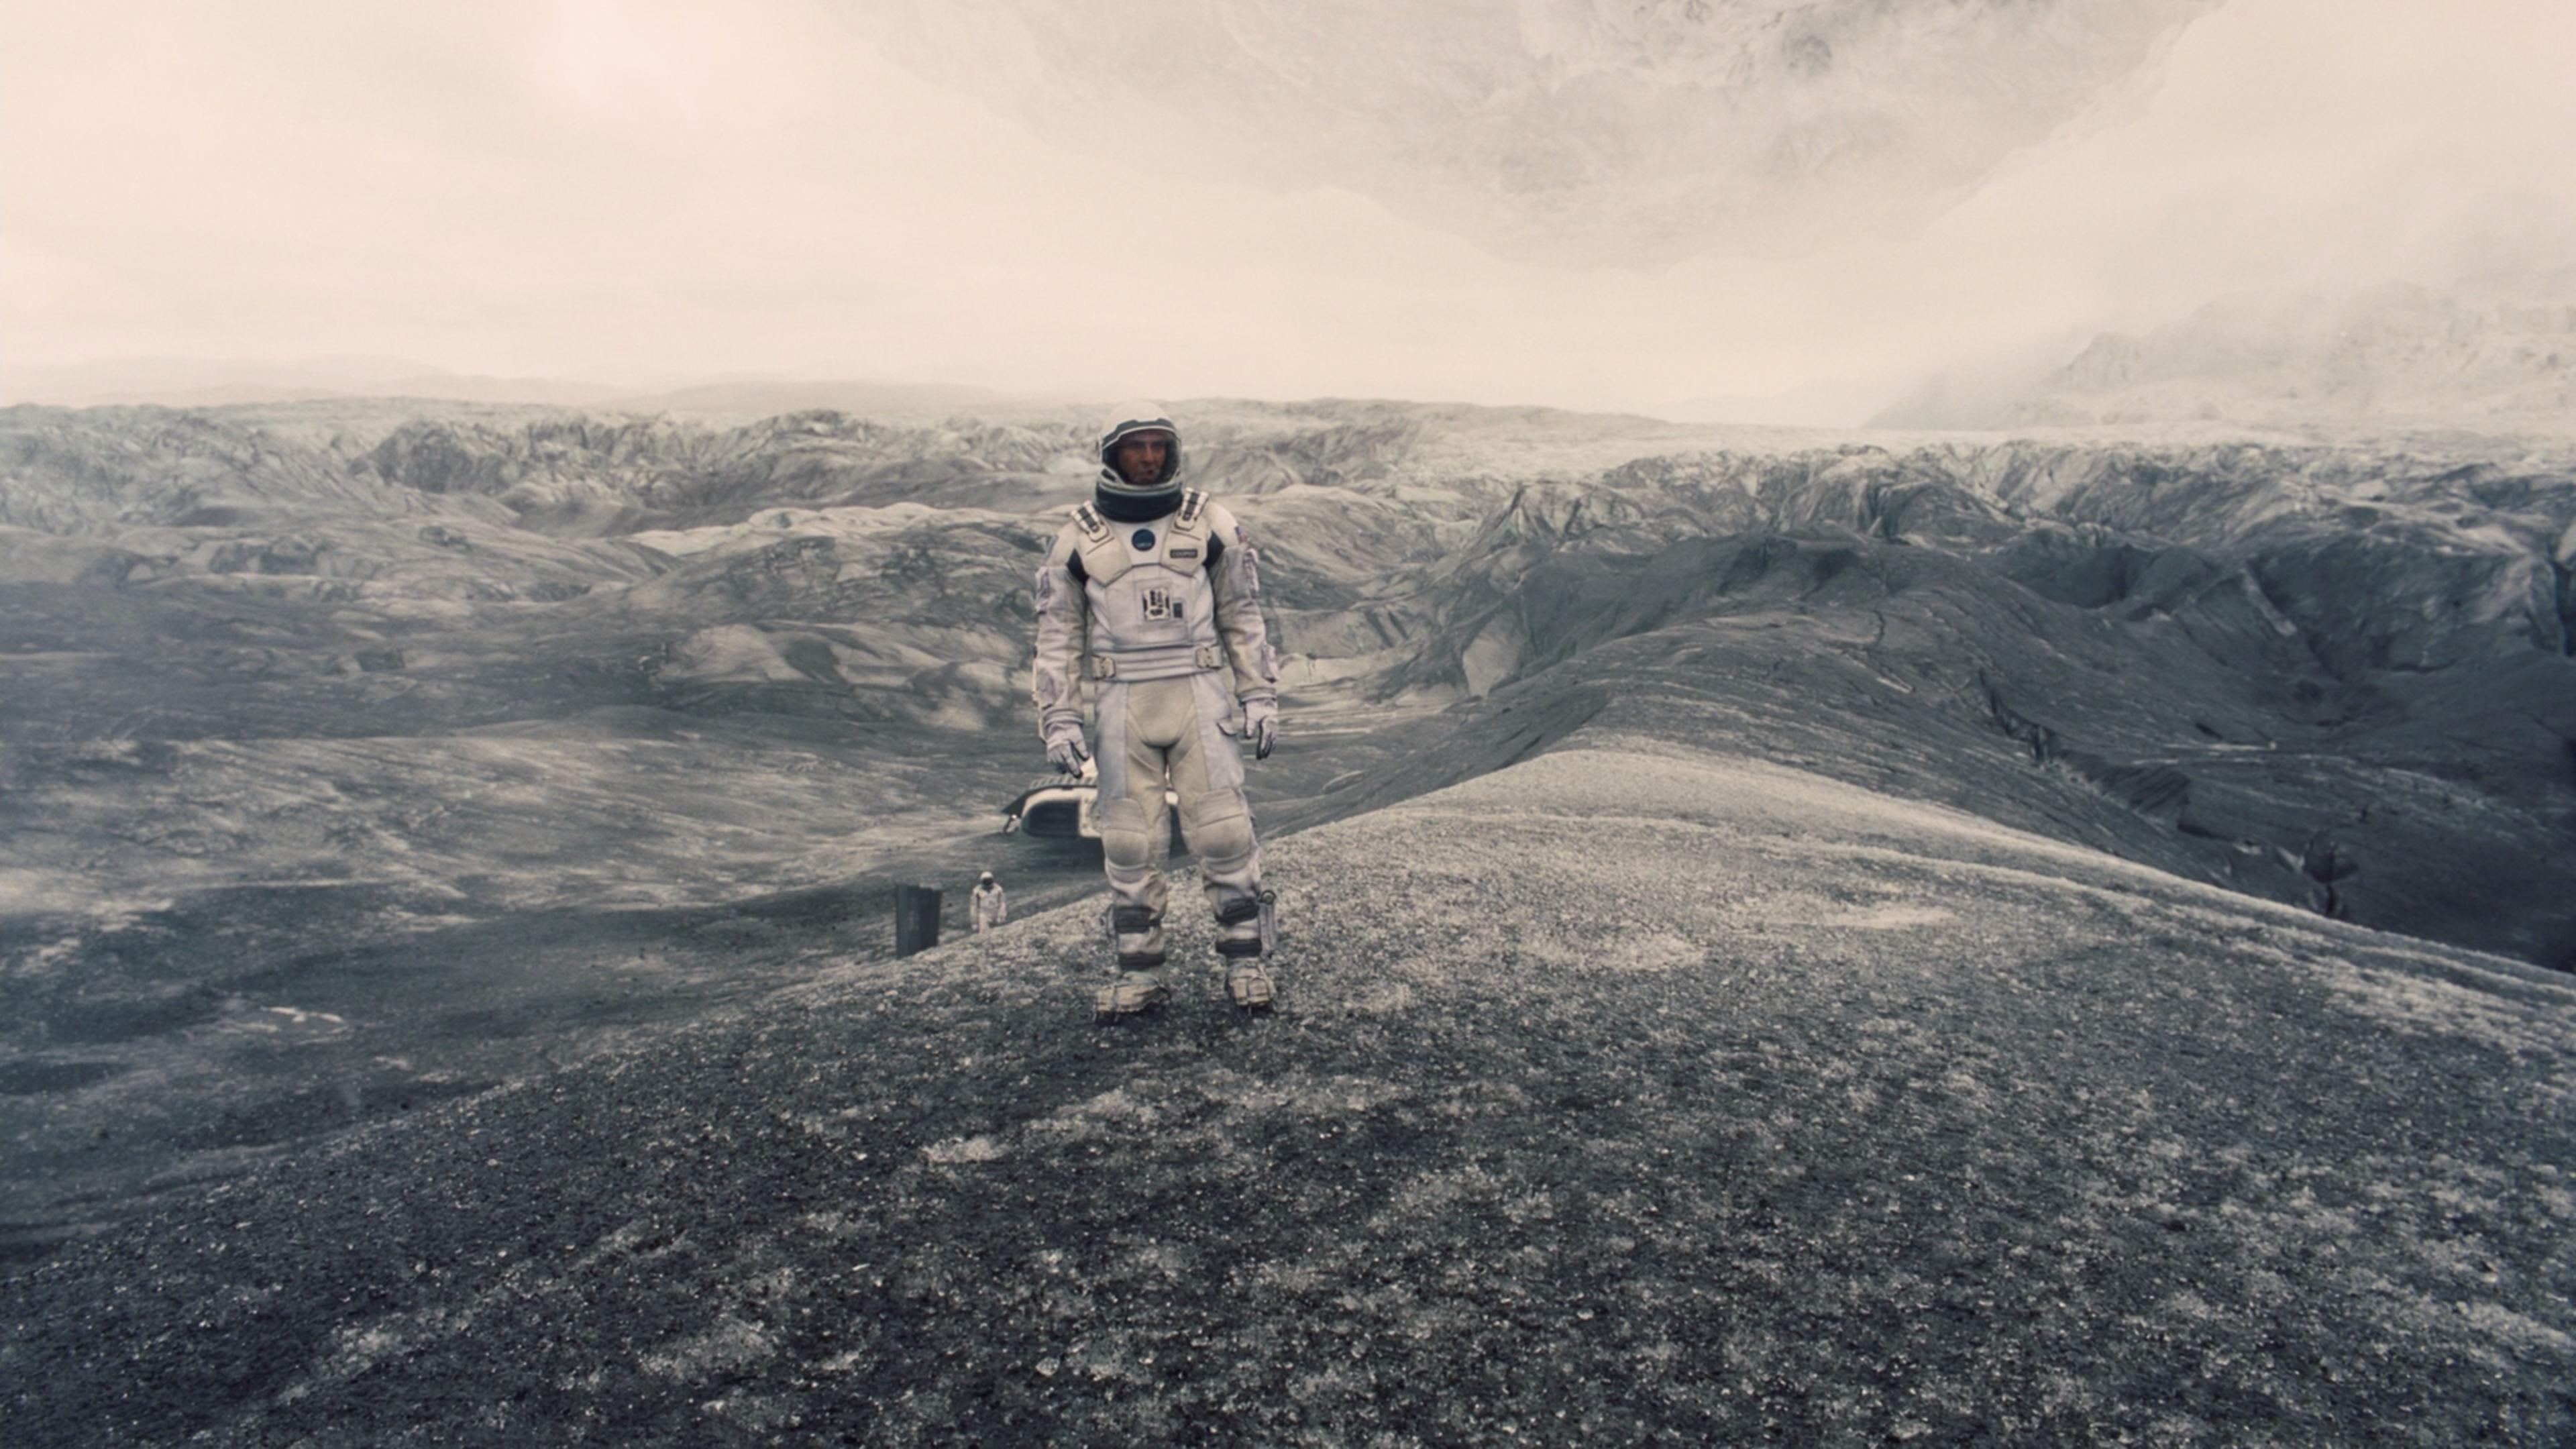 Interstellar 4k Ultra Hd Blu Ray Ultra Hd Review High